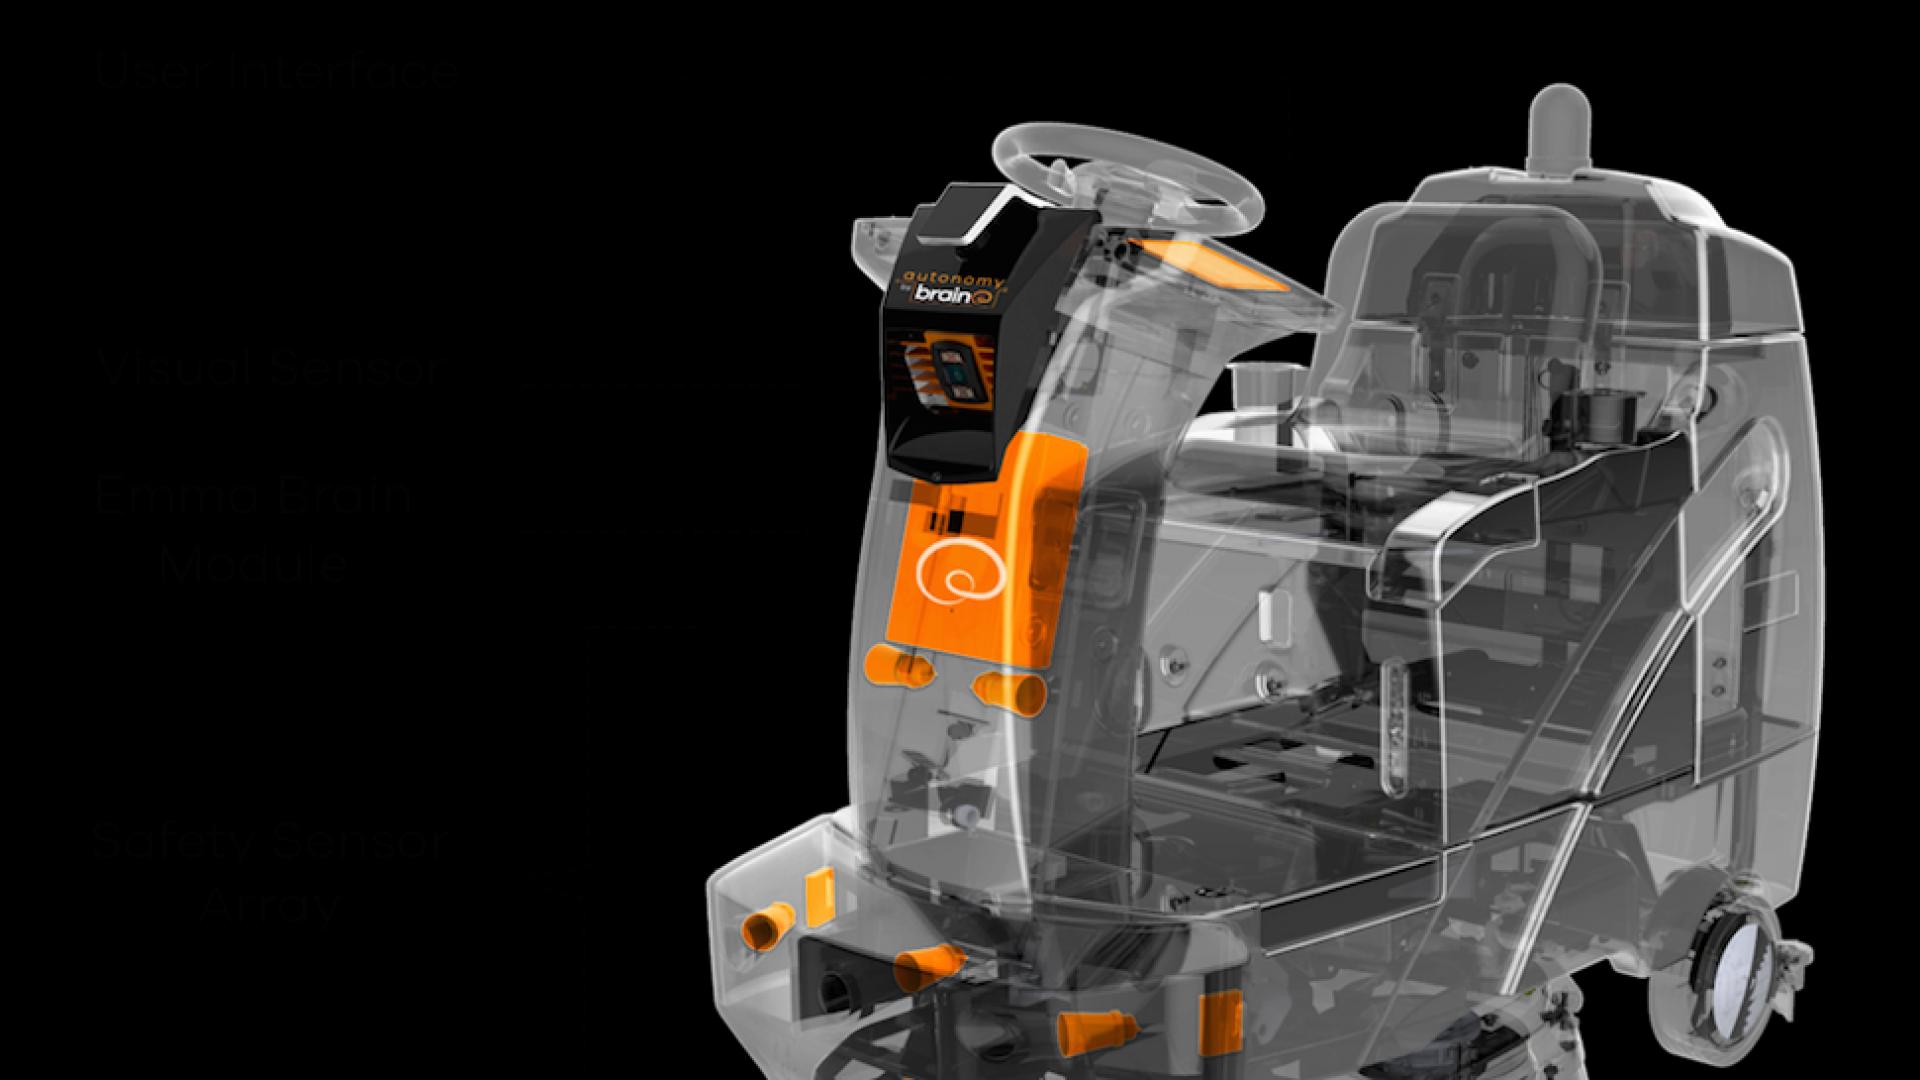 An EMMA-enabled floor scrubbing machine from Brain Corporation.